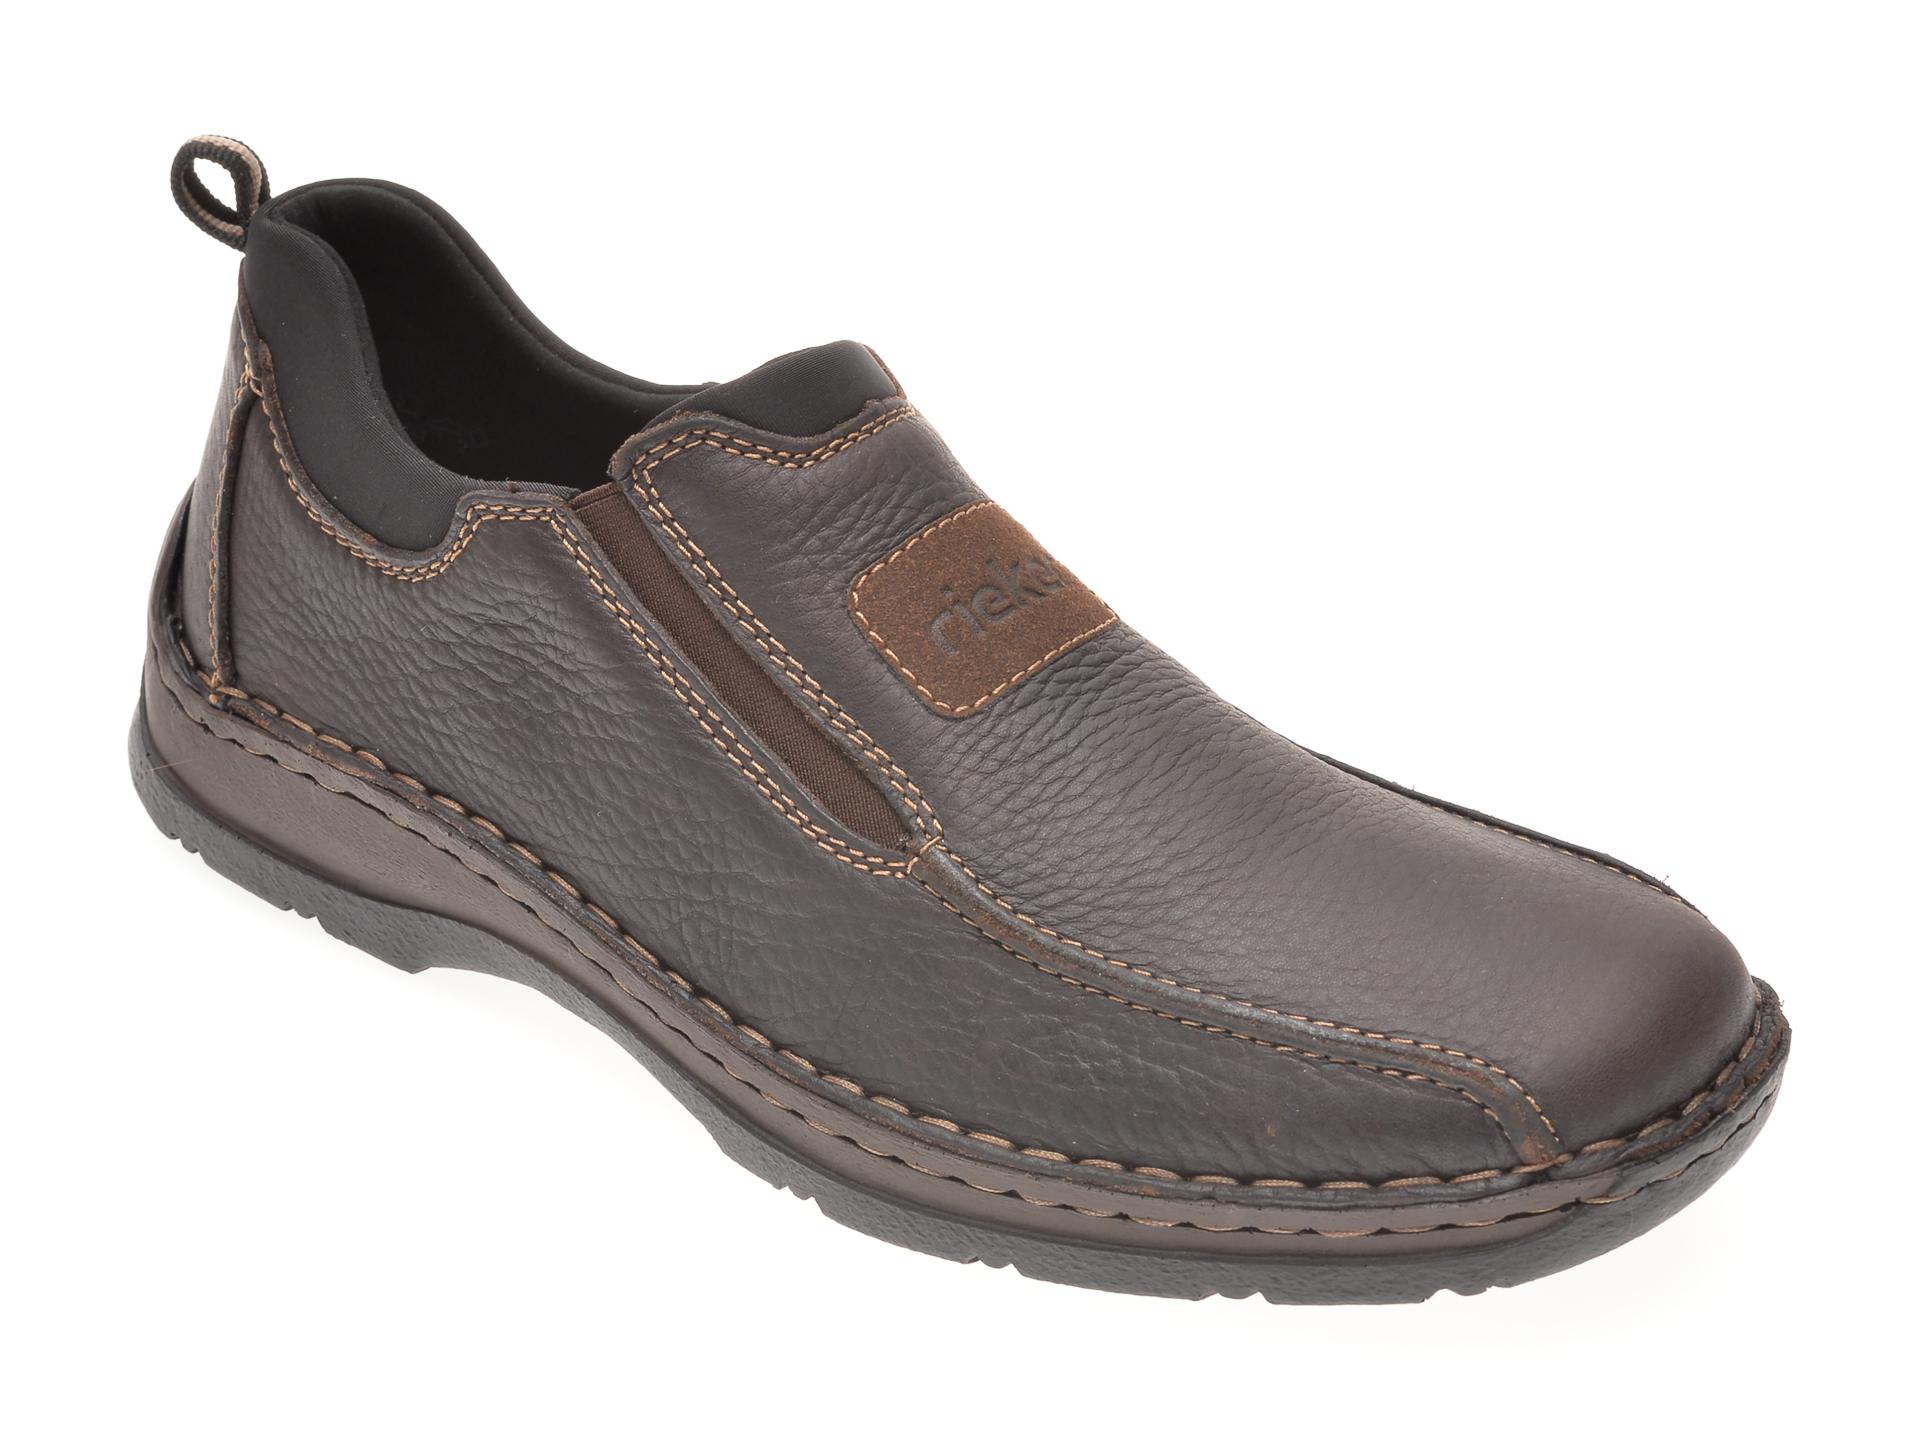 Pantofi Rieker Negri, 5363, Din Piele Naturala